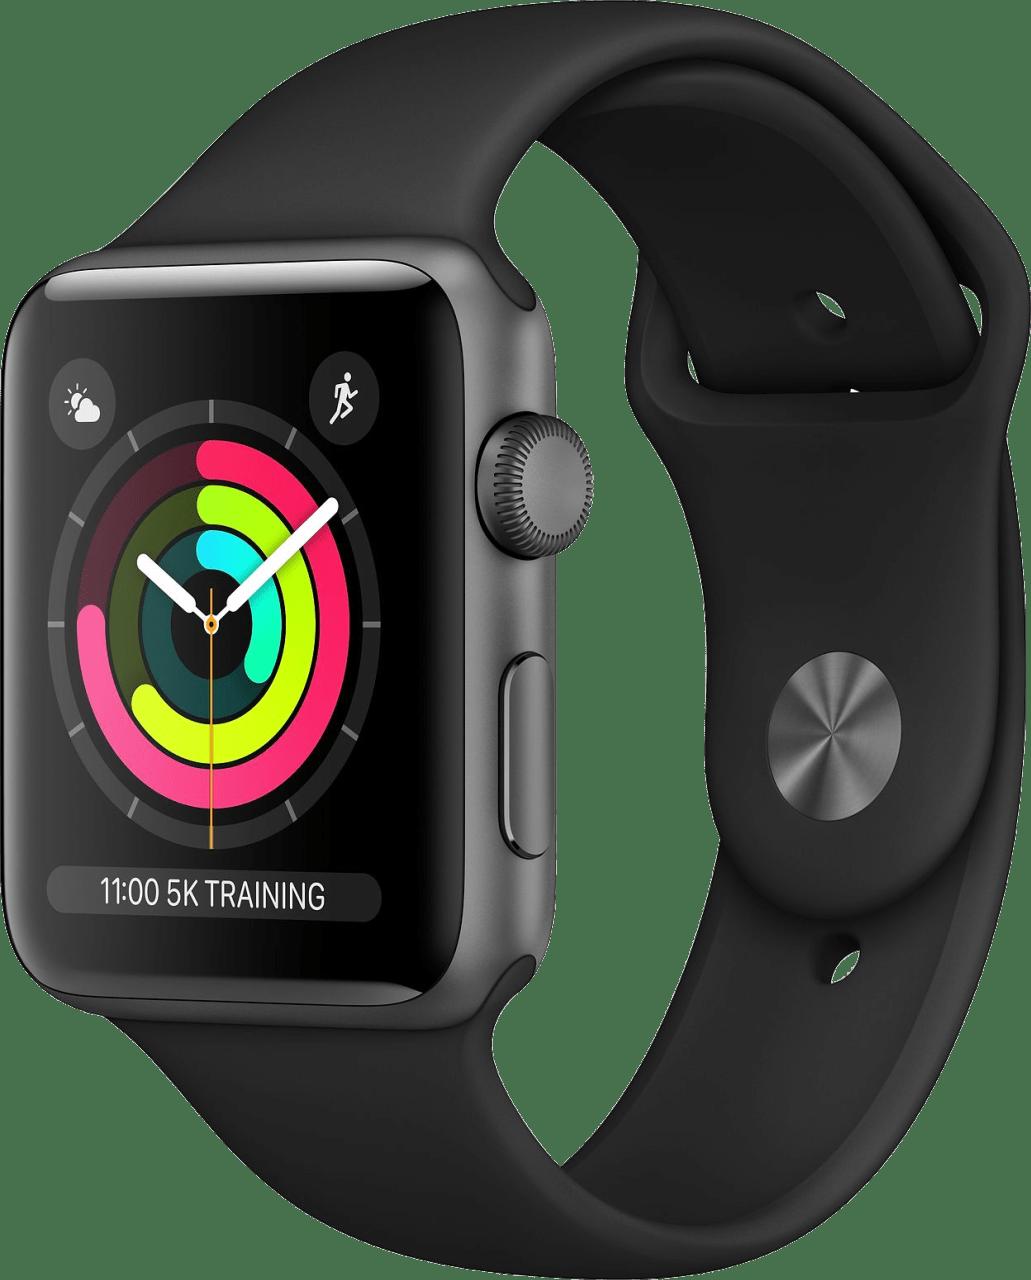 Schwarz Apple Watch Series 3 GPS, 42mm.2